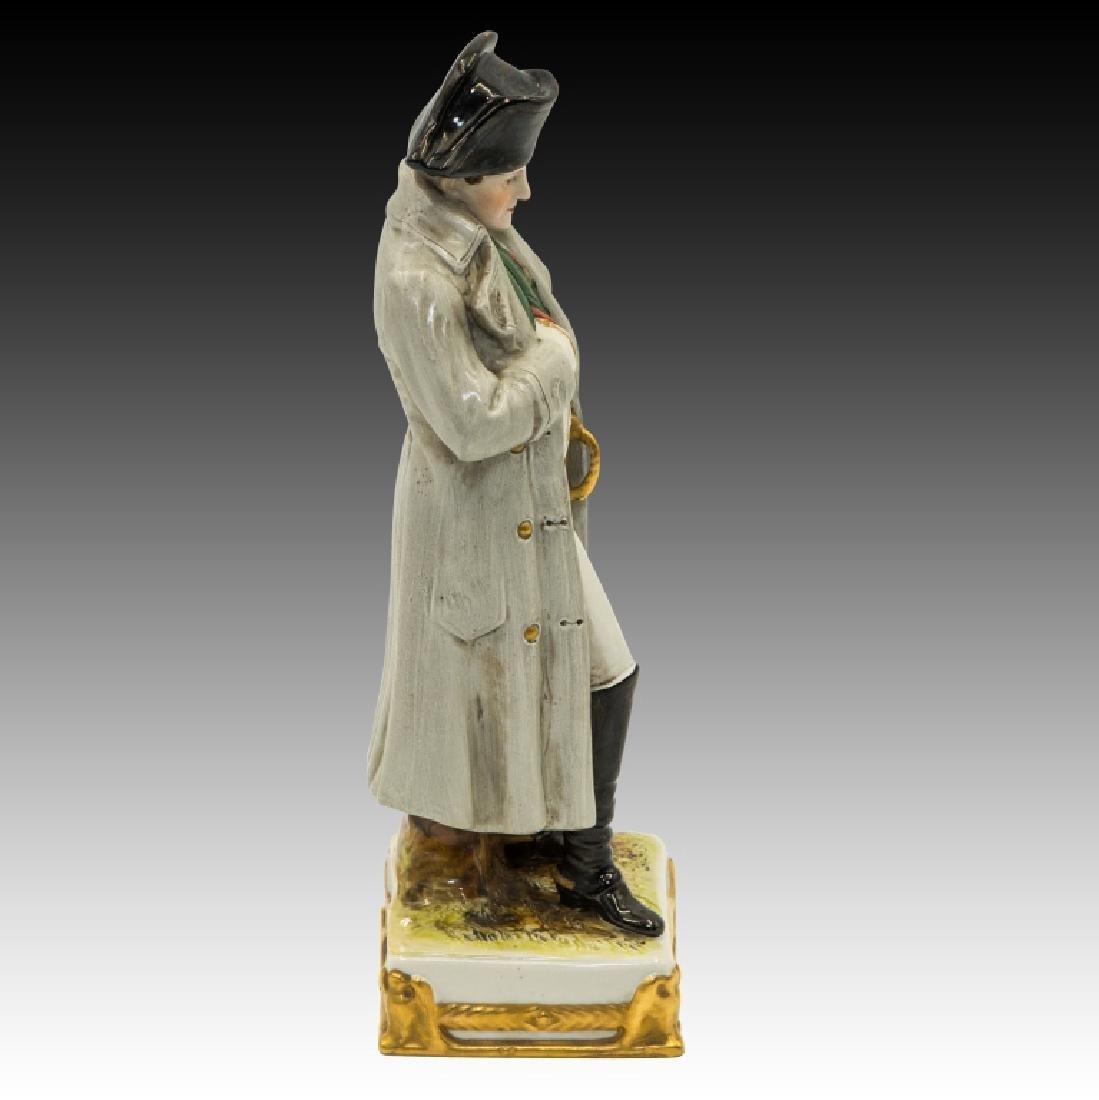 2 Figurines Napoleon and Ticouette - 9